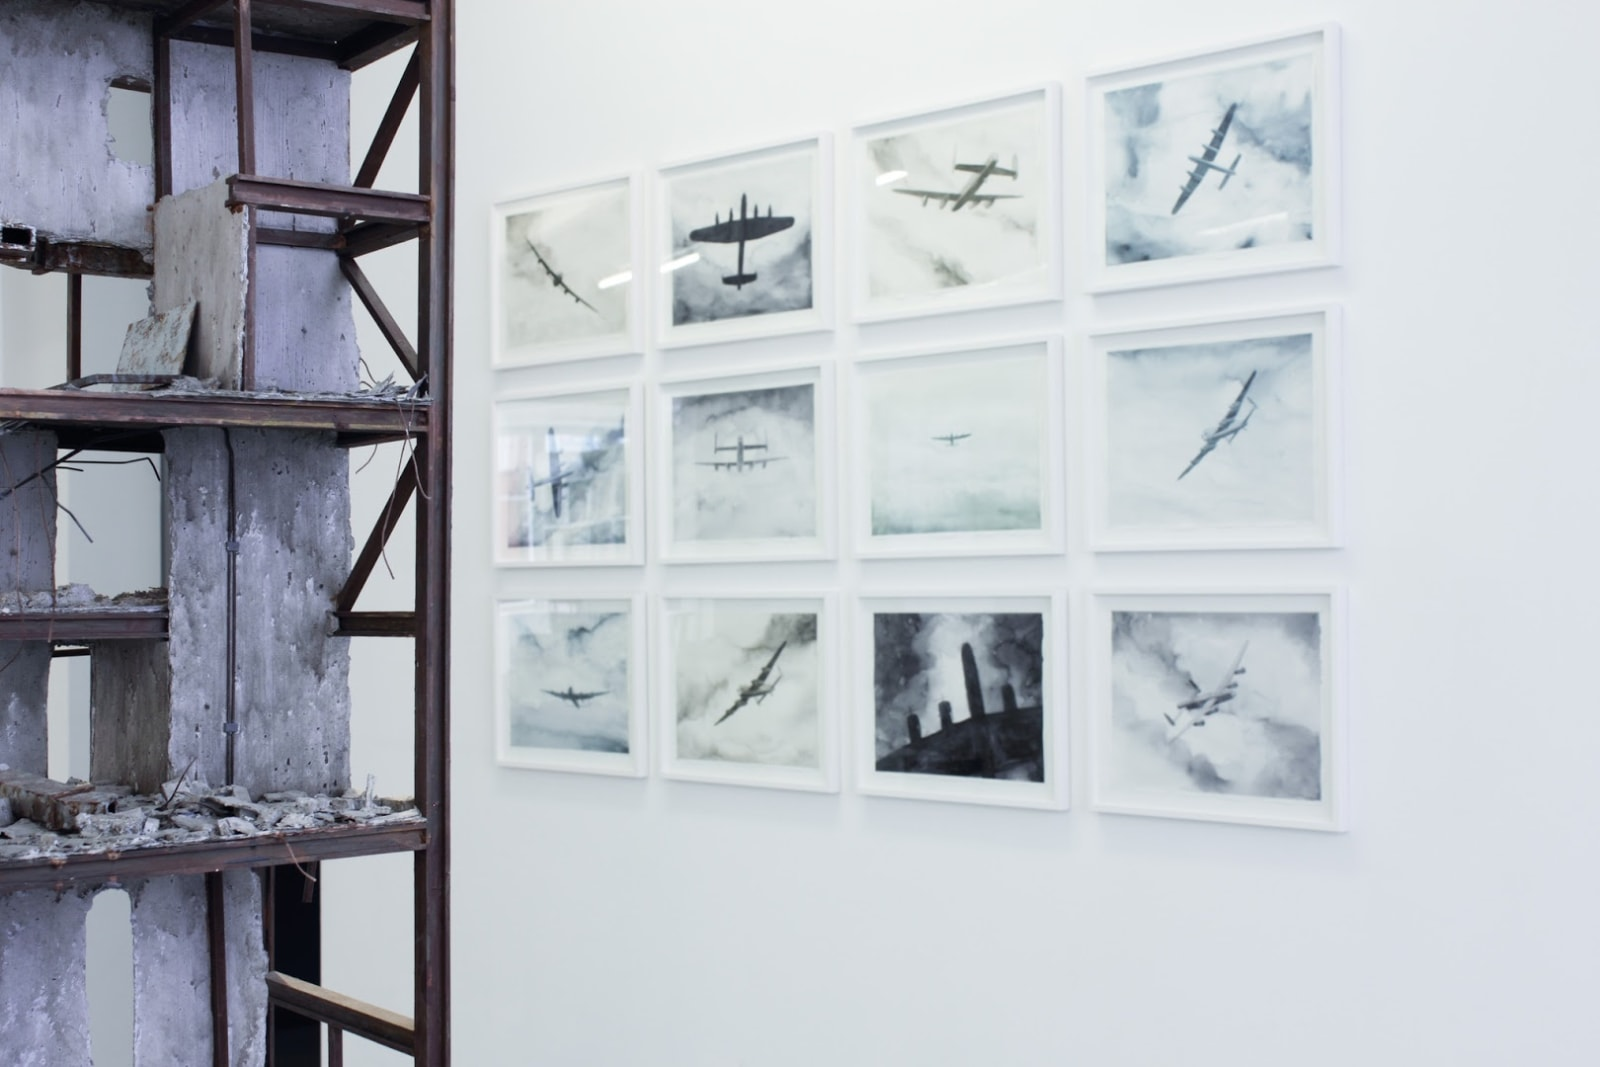 Tobias Bernstrup Installation view, Andréhn-Schiptjenko, Stockholm, Sweden, 2014